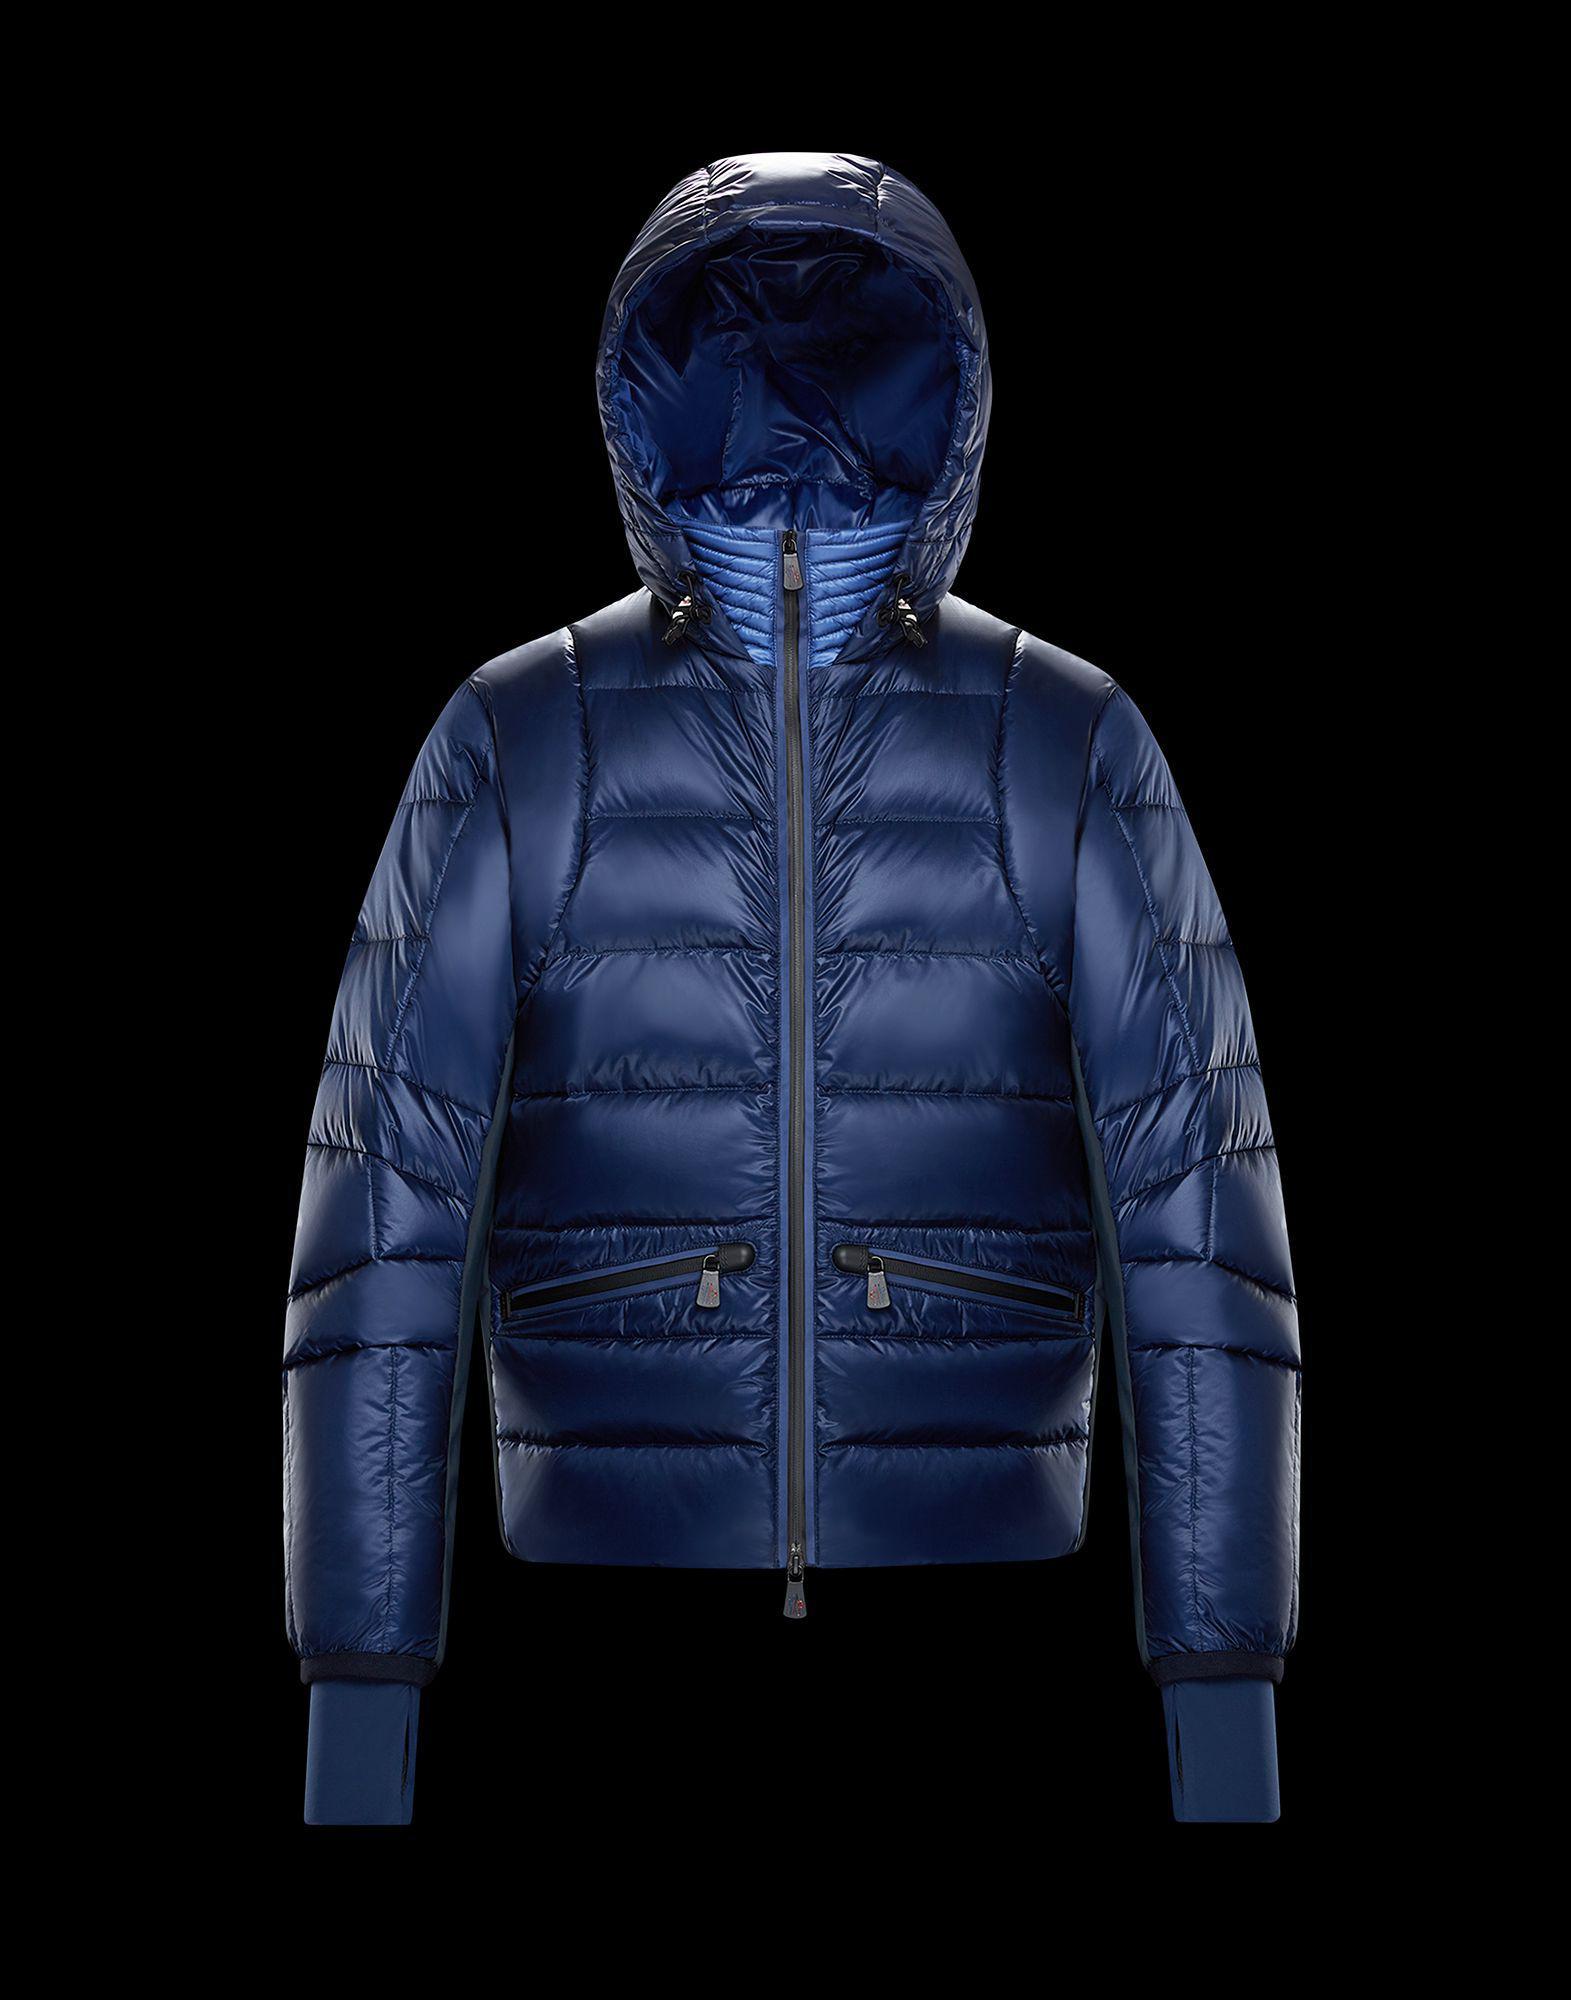 959e2babbd9dd Moncler Grenoble Mouthe in Blue for Men - Lyst